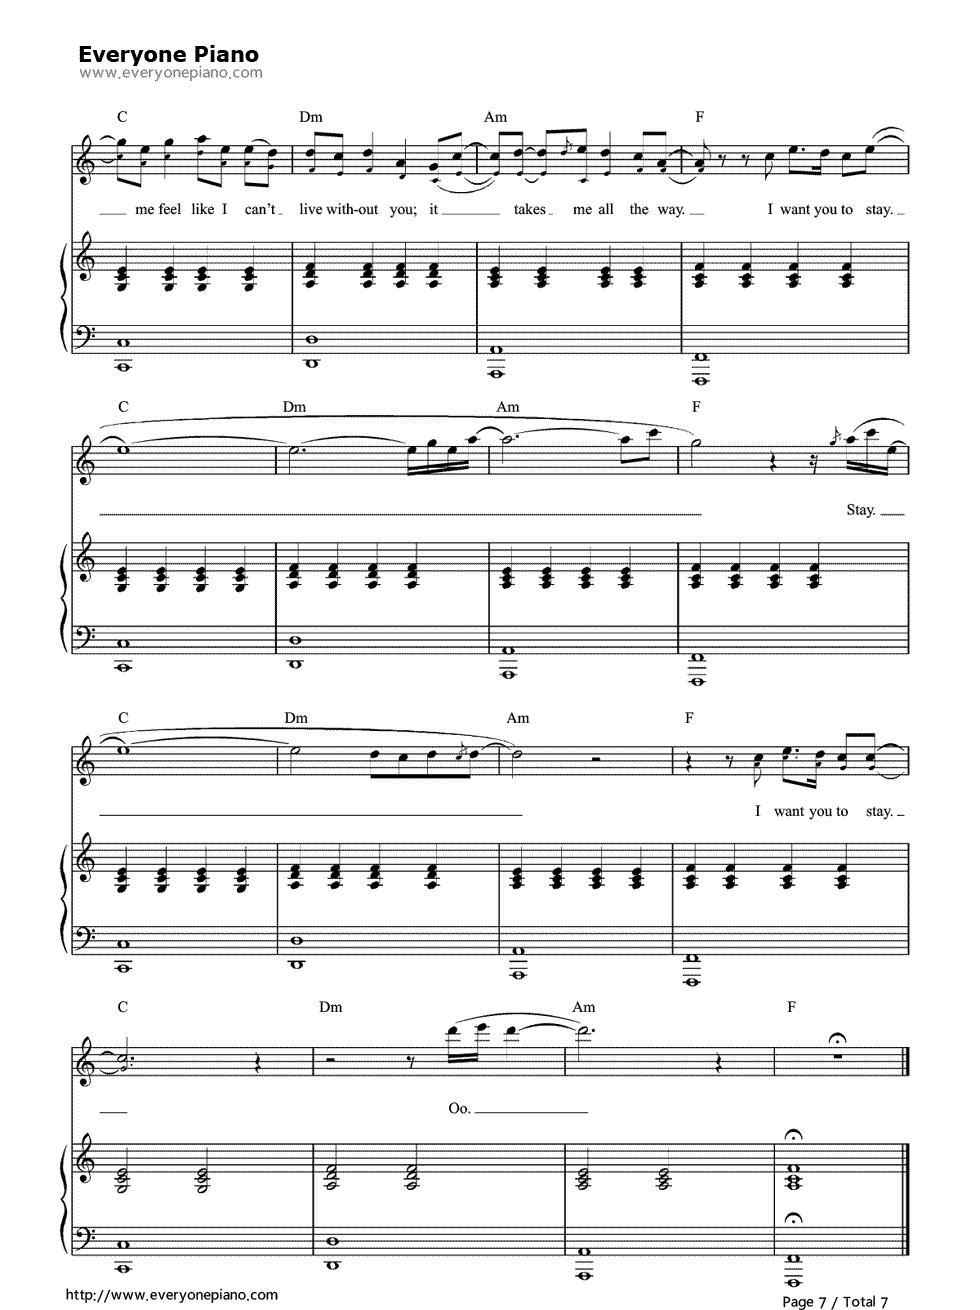 Free stay rihanna and mikky ekko sheet music preview 7 page 7 free stay rihanna and mikky ekko sheet music preview 7 page 7 hexwebz Choice Image